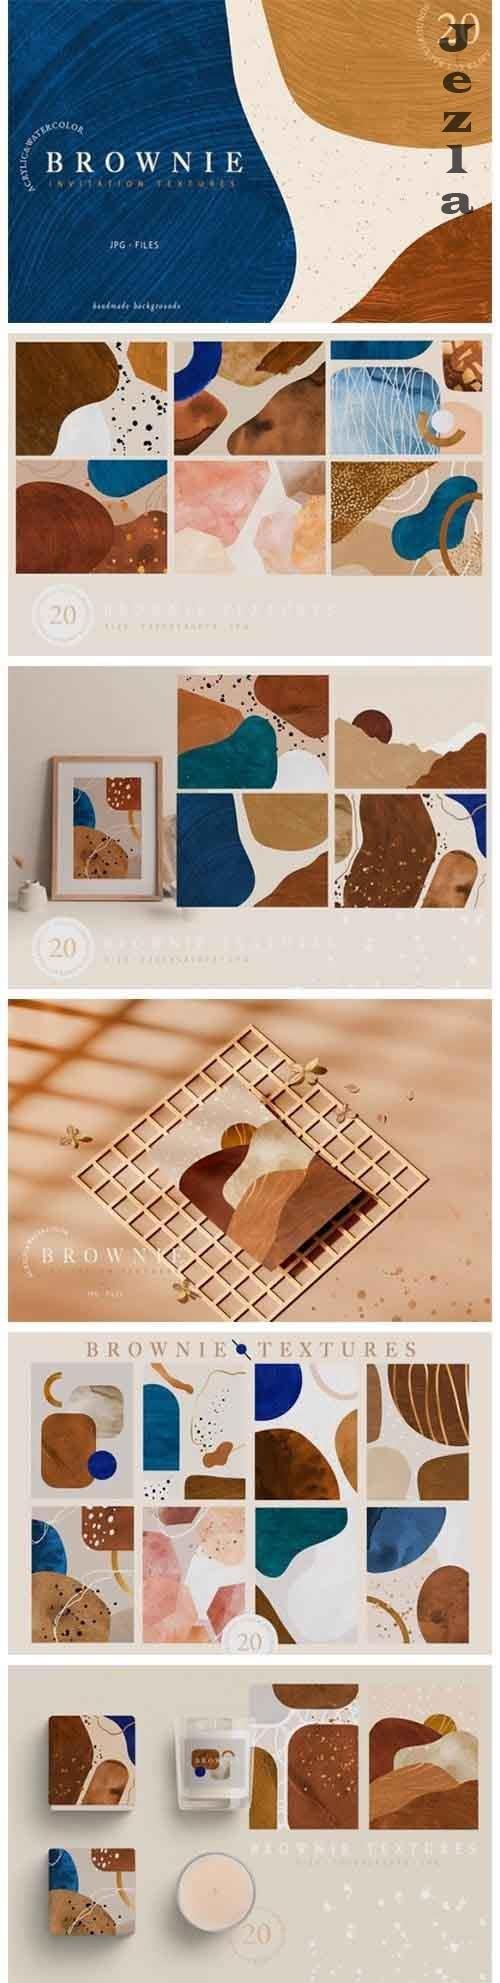 Brownie Invitation Textures - 5016646